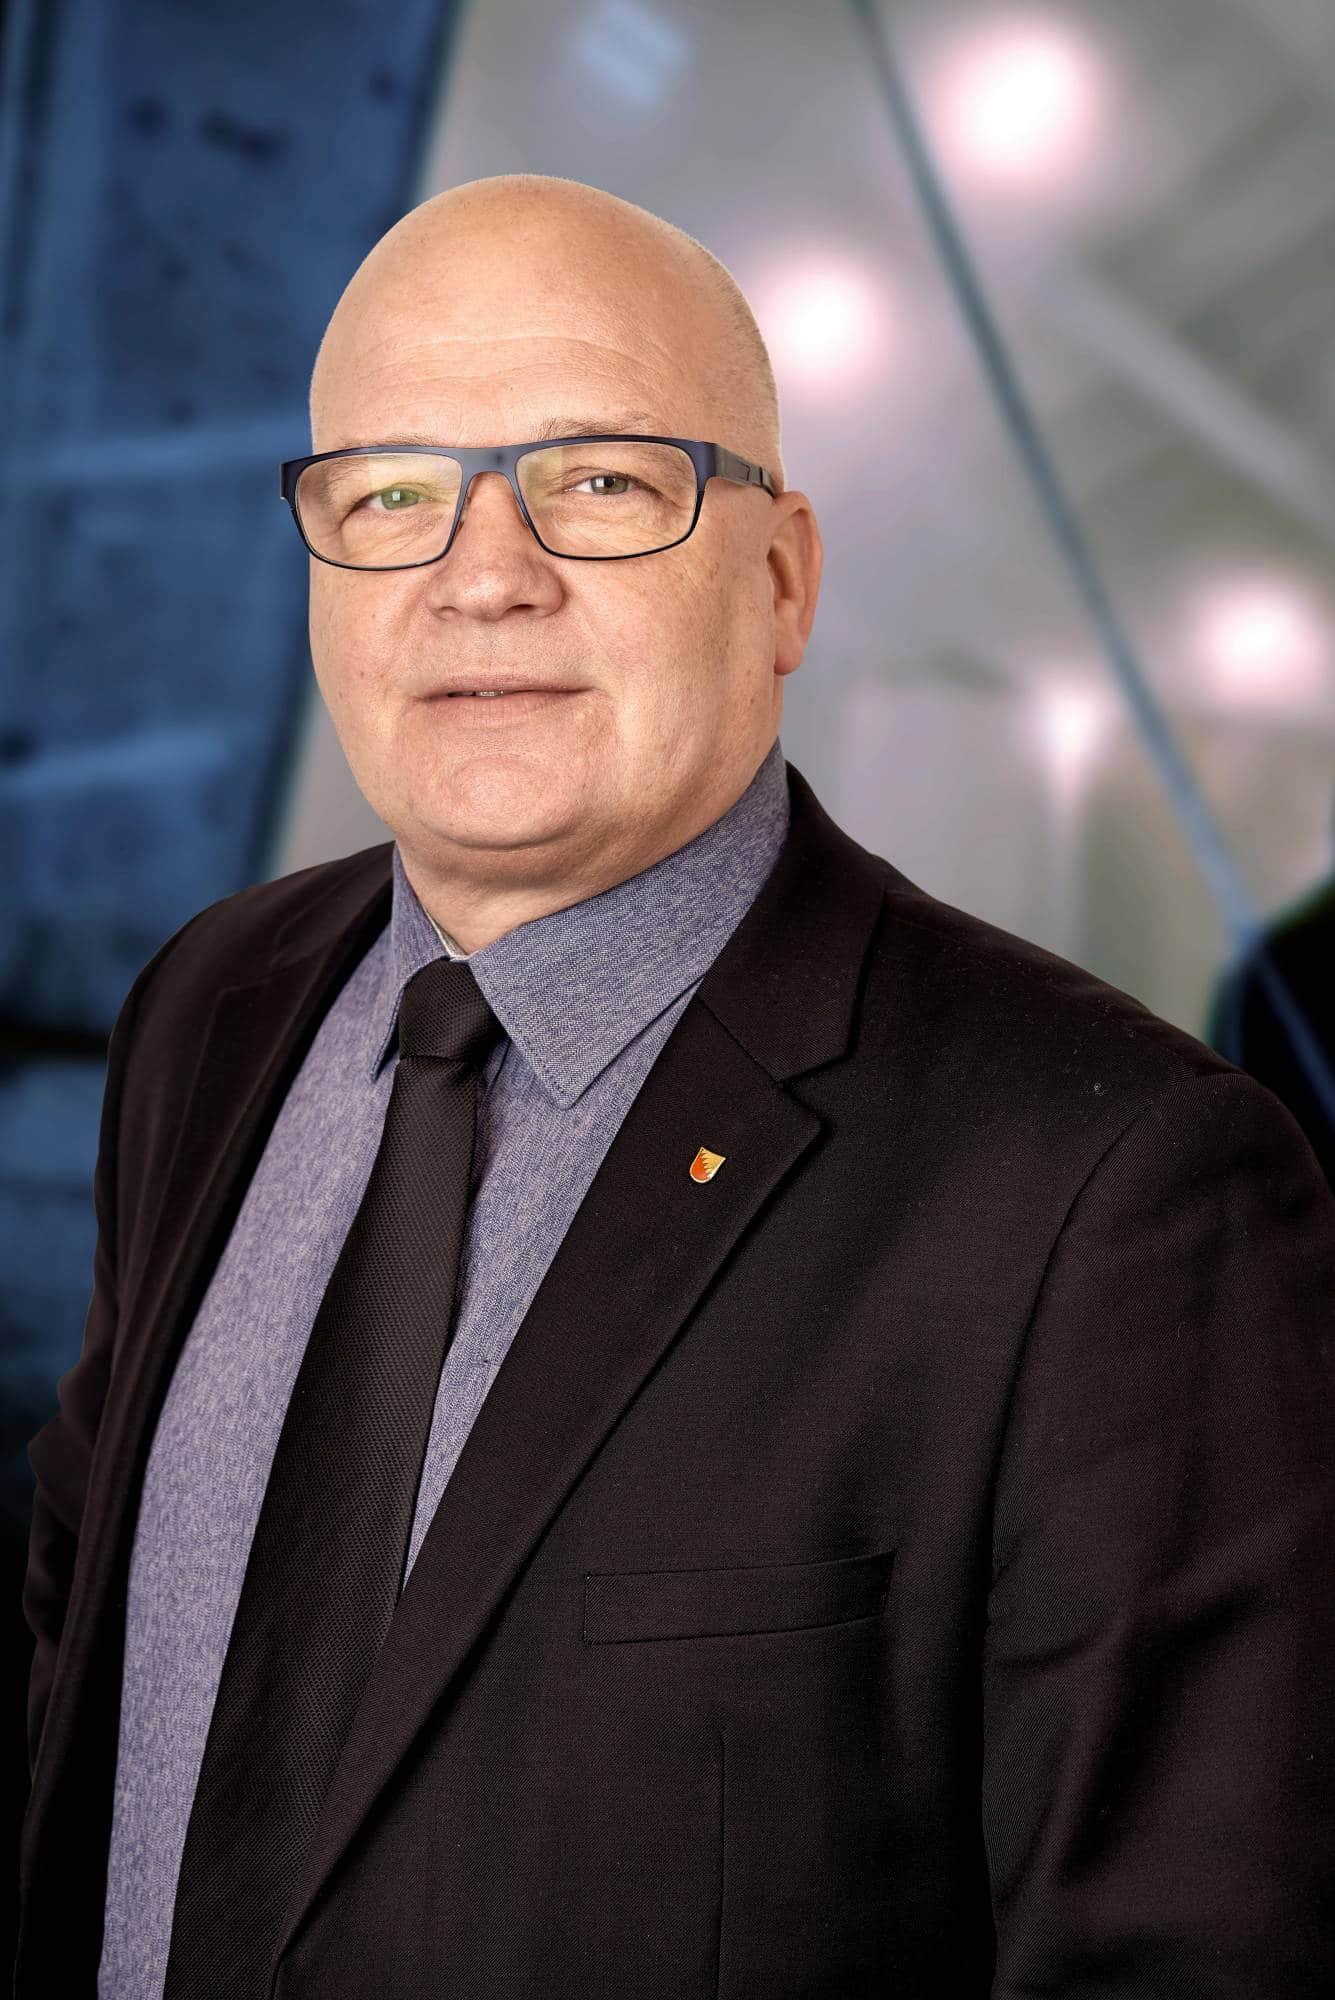 Niels Hörup, Borgmester Solrød kommune, Solrød Biogas